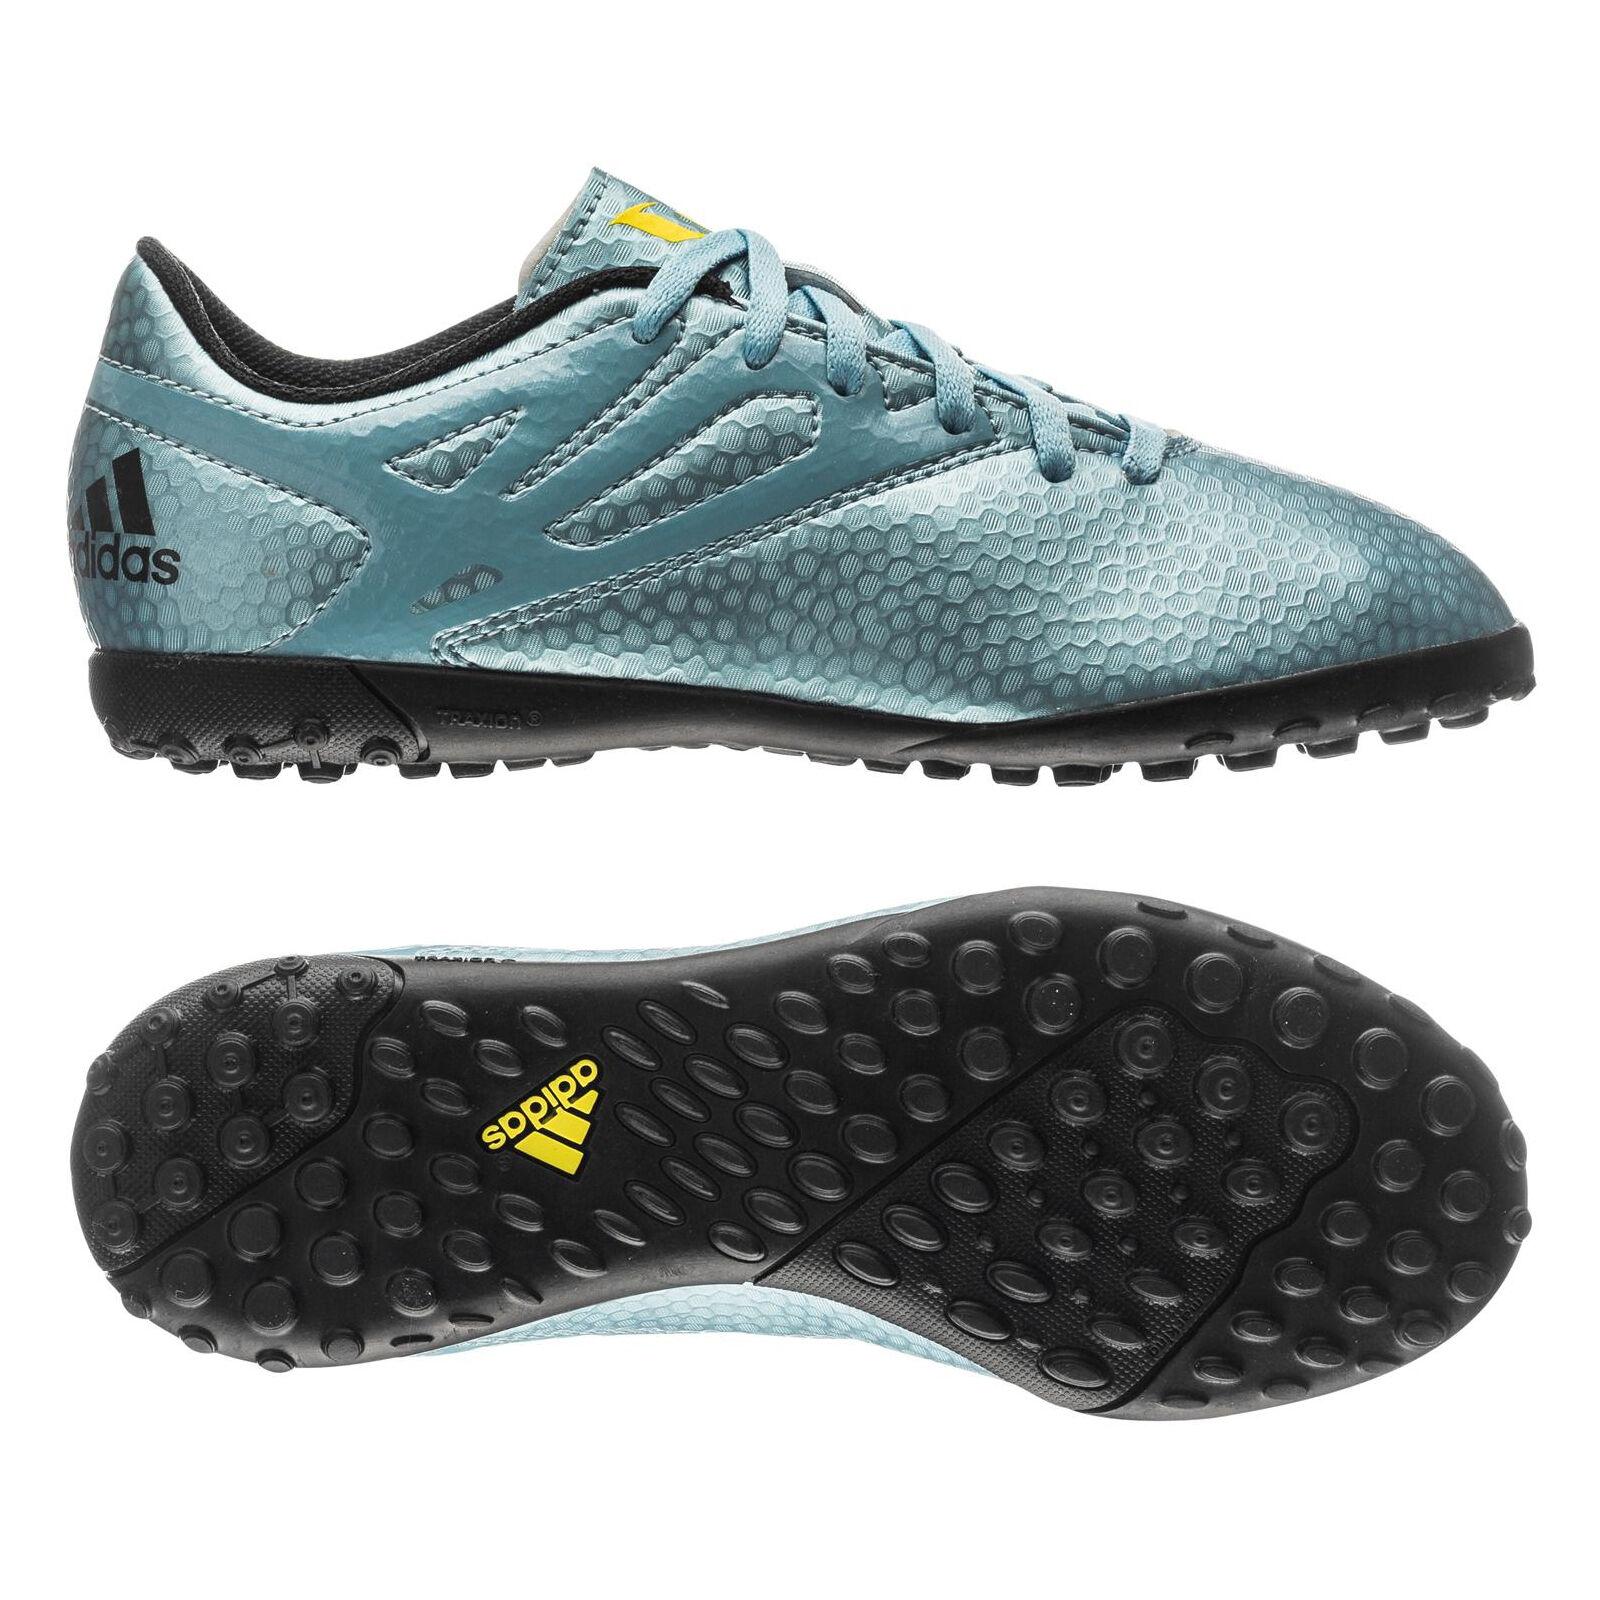 Adidas Messi 15.4 Turf Shoes Football Soccer Boots Mens ...